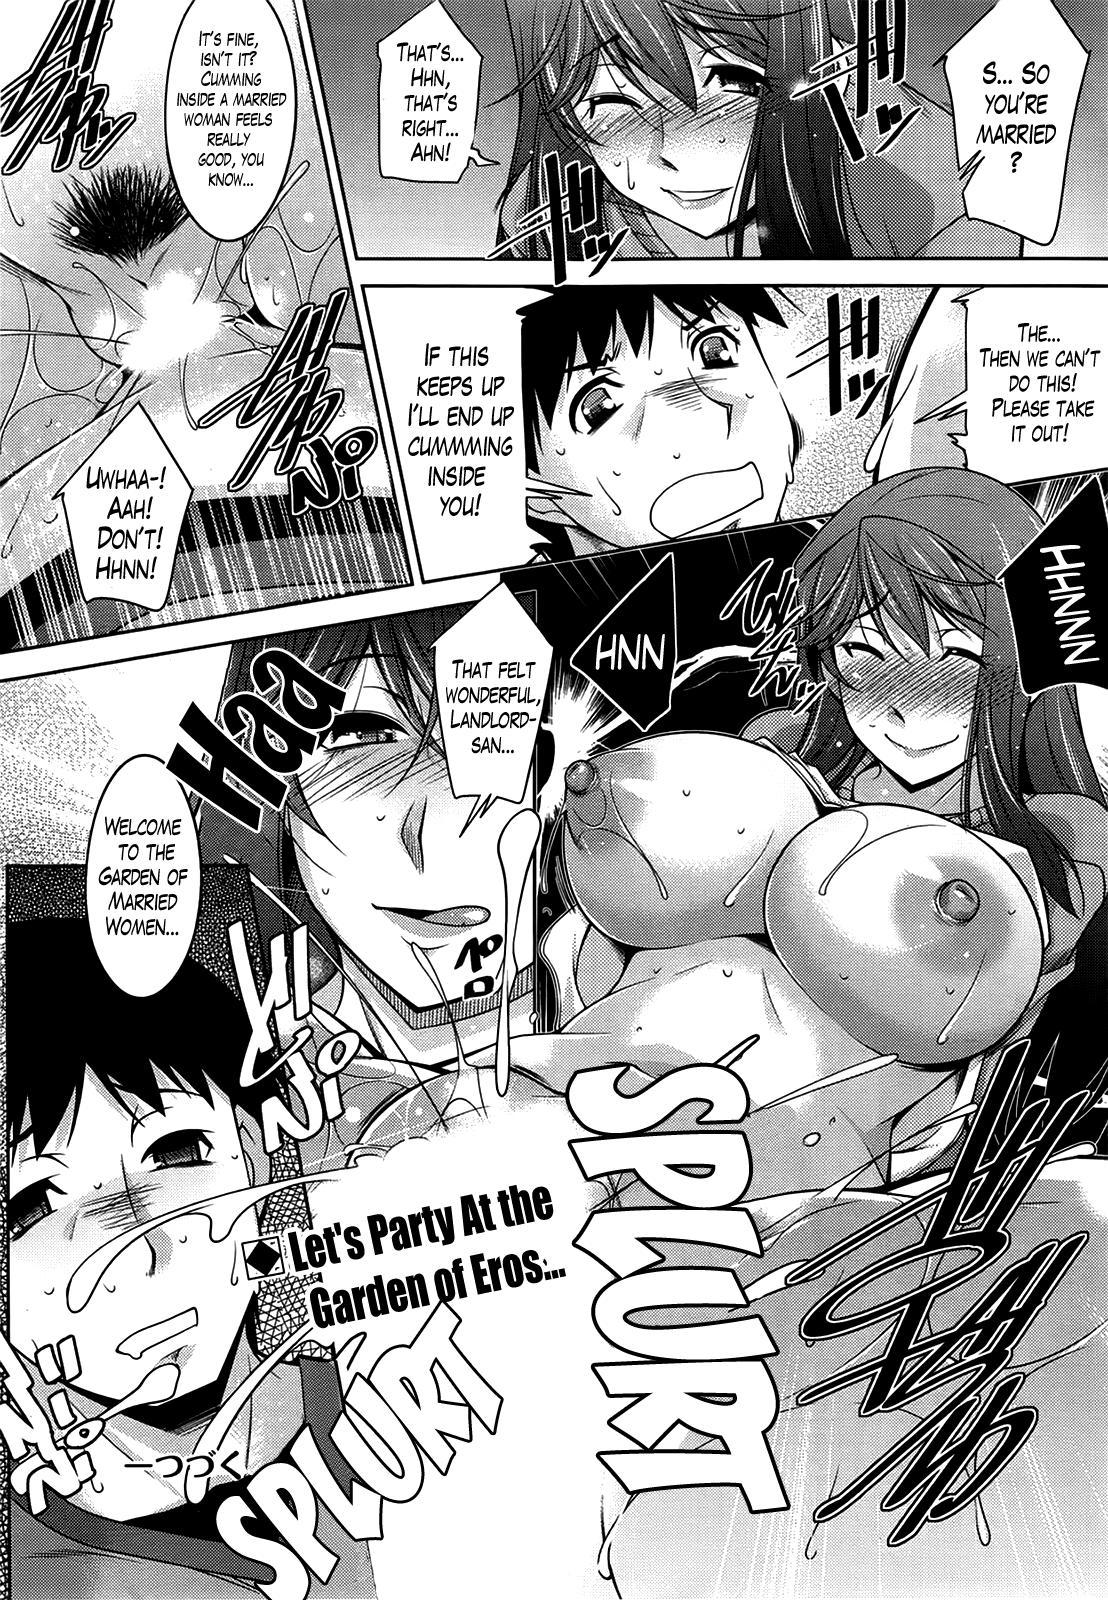 [Zen9] Taikutsu na Gogo no Sugoshikata Ch. 1-4   A Way to Spend a Boring Afternoon Ch. 1-4 (Action Pizazz DX 2013-12) [English](hentai2read.com)[Lazarus H] 18